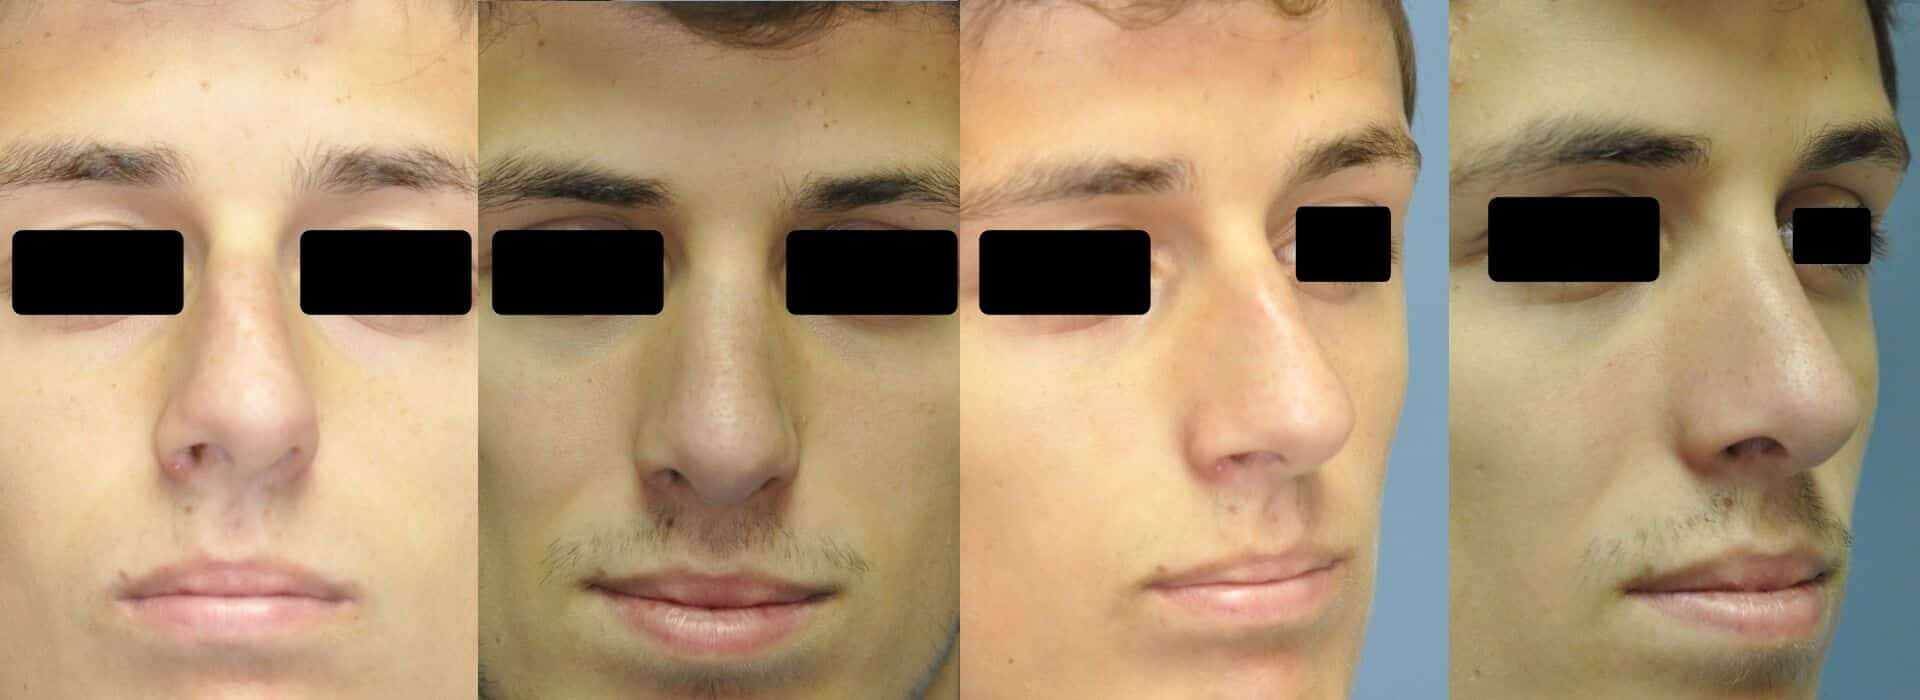 Grande rinoplastia hombre nariz